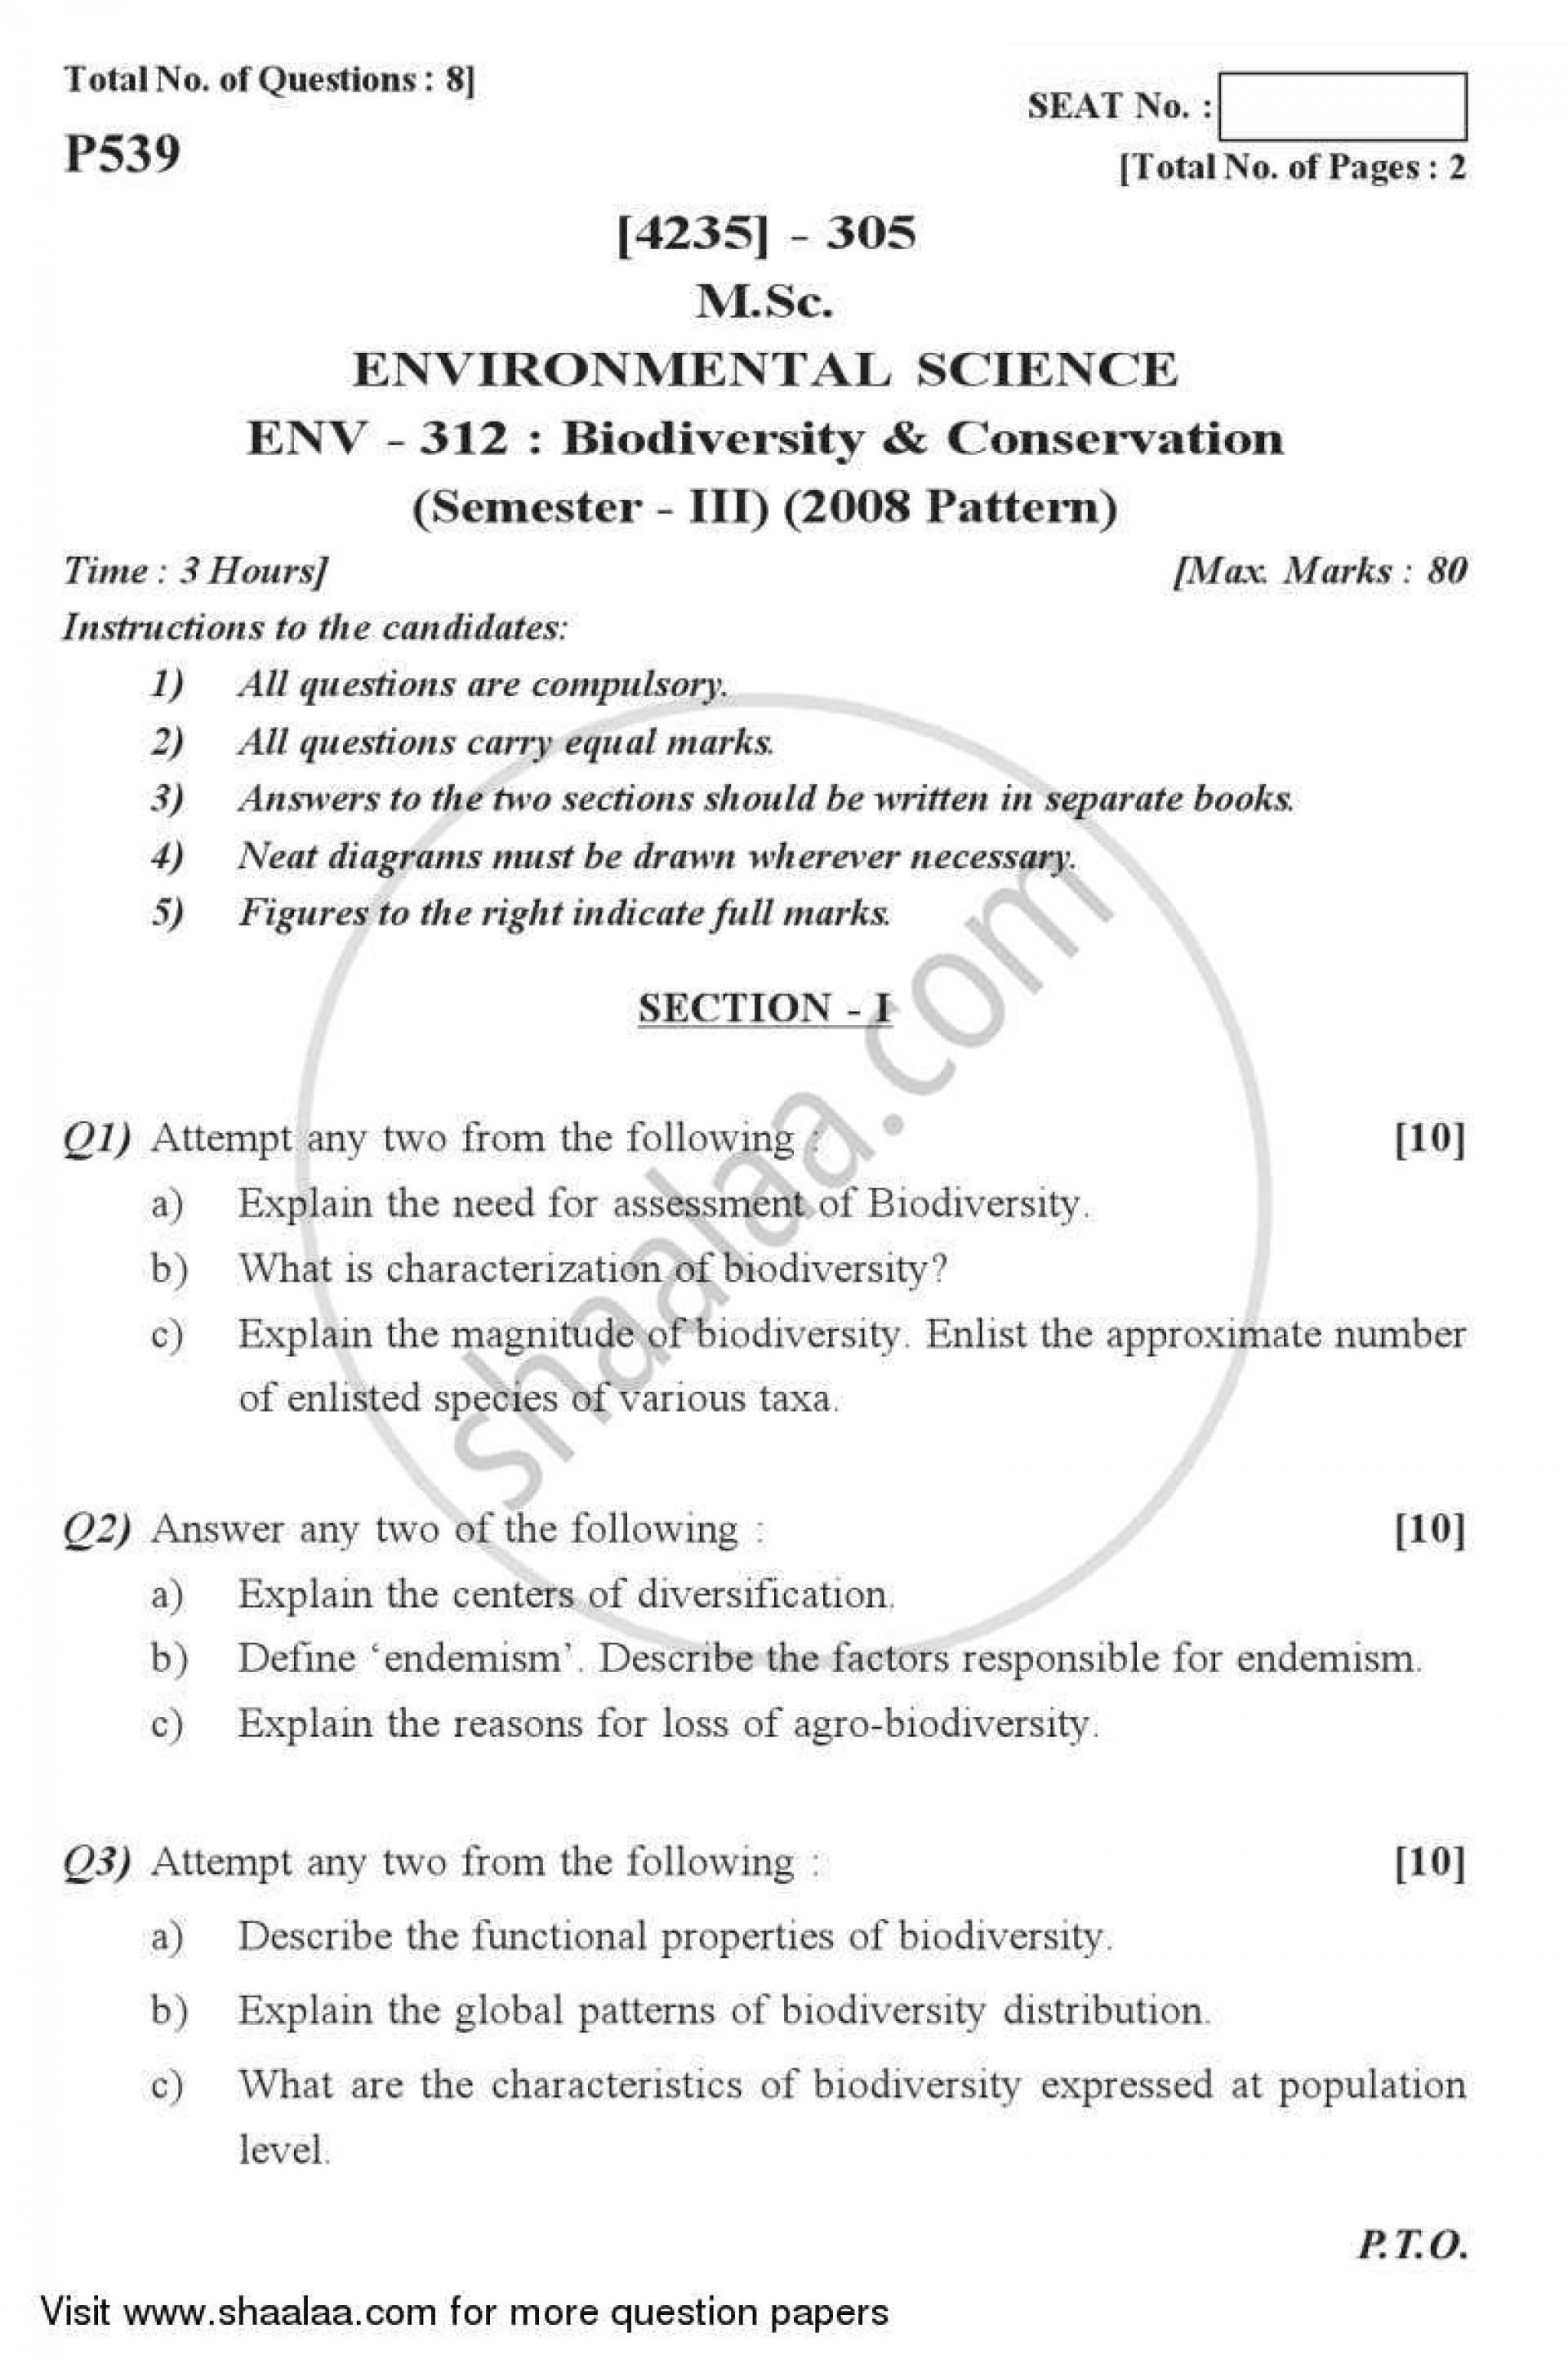 001 Essay Example Biodiversity Topics University Of Pune Master Msc Conservation Environmental Science Semester 2013 2101f4167960044618caf40eb408c72b0 Phenomenal Questions 1920